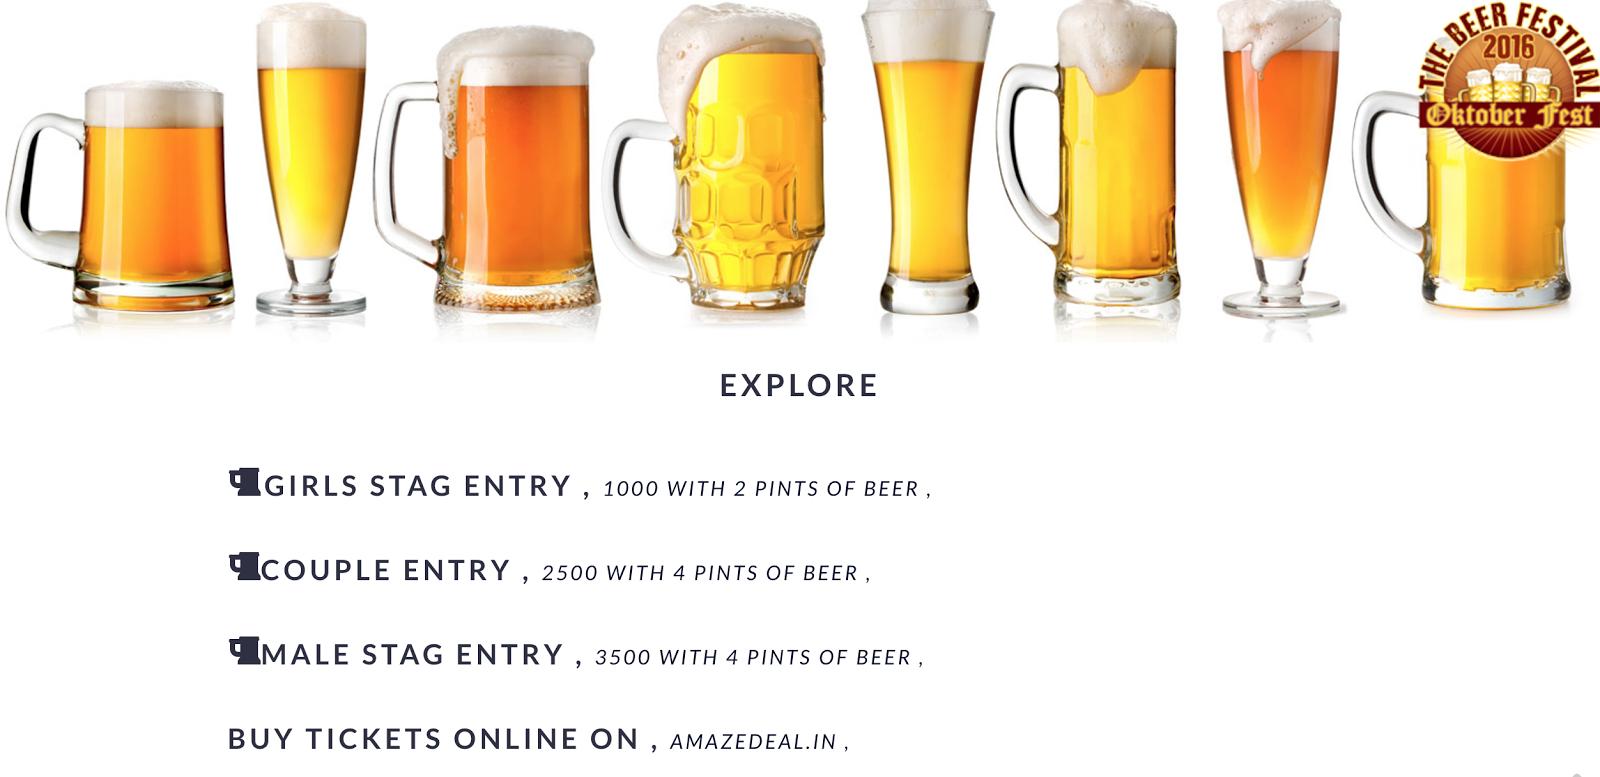 Oktoberfest entry fee